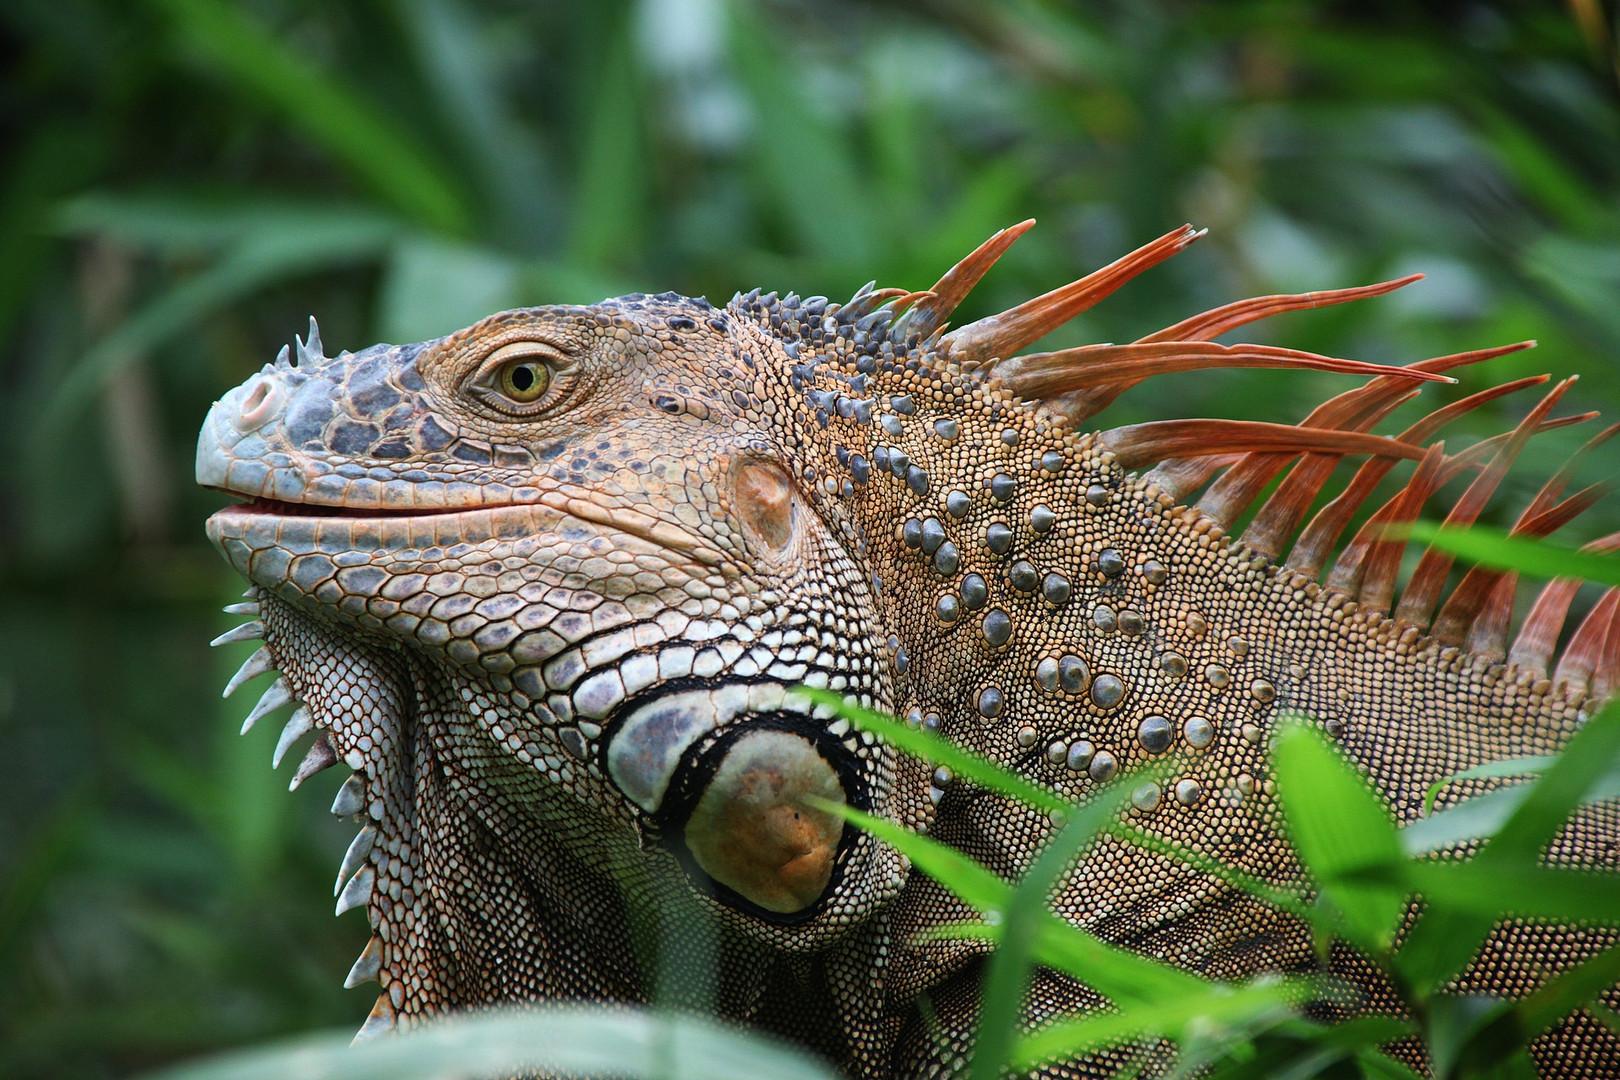 iguana-927656_1920.jpg